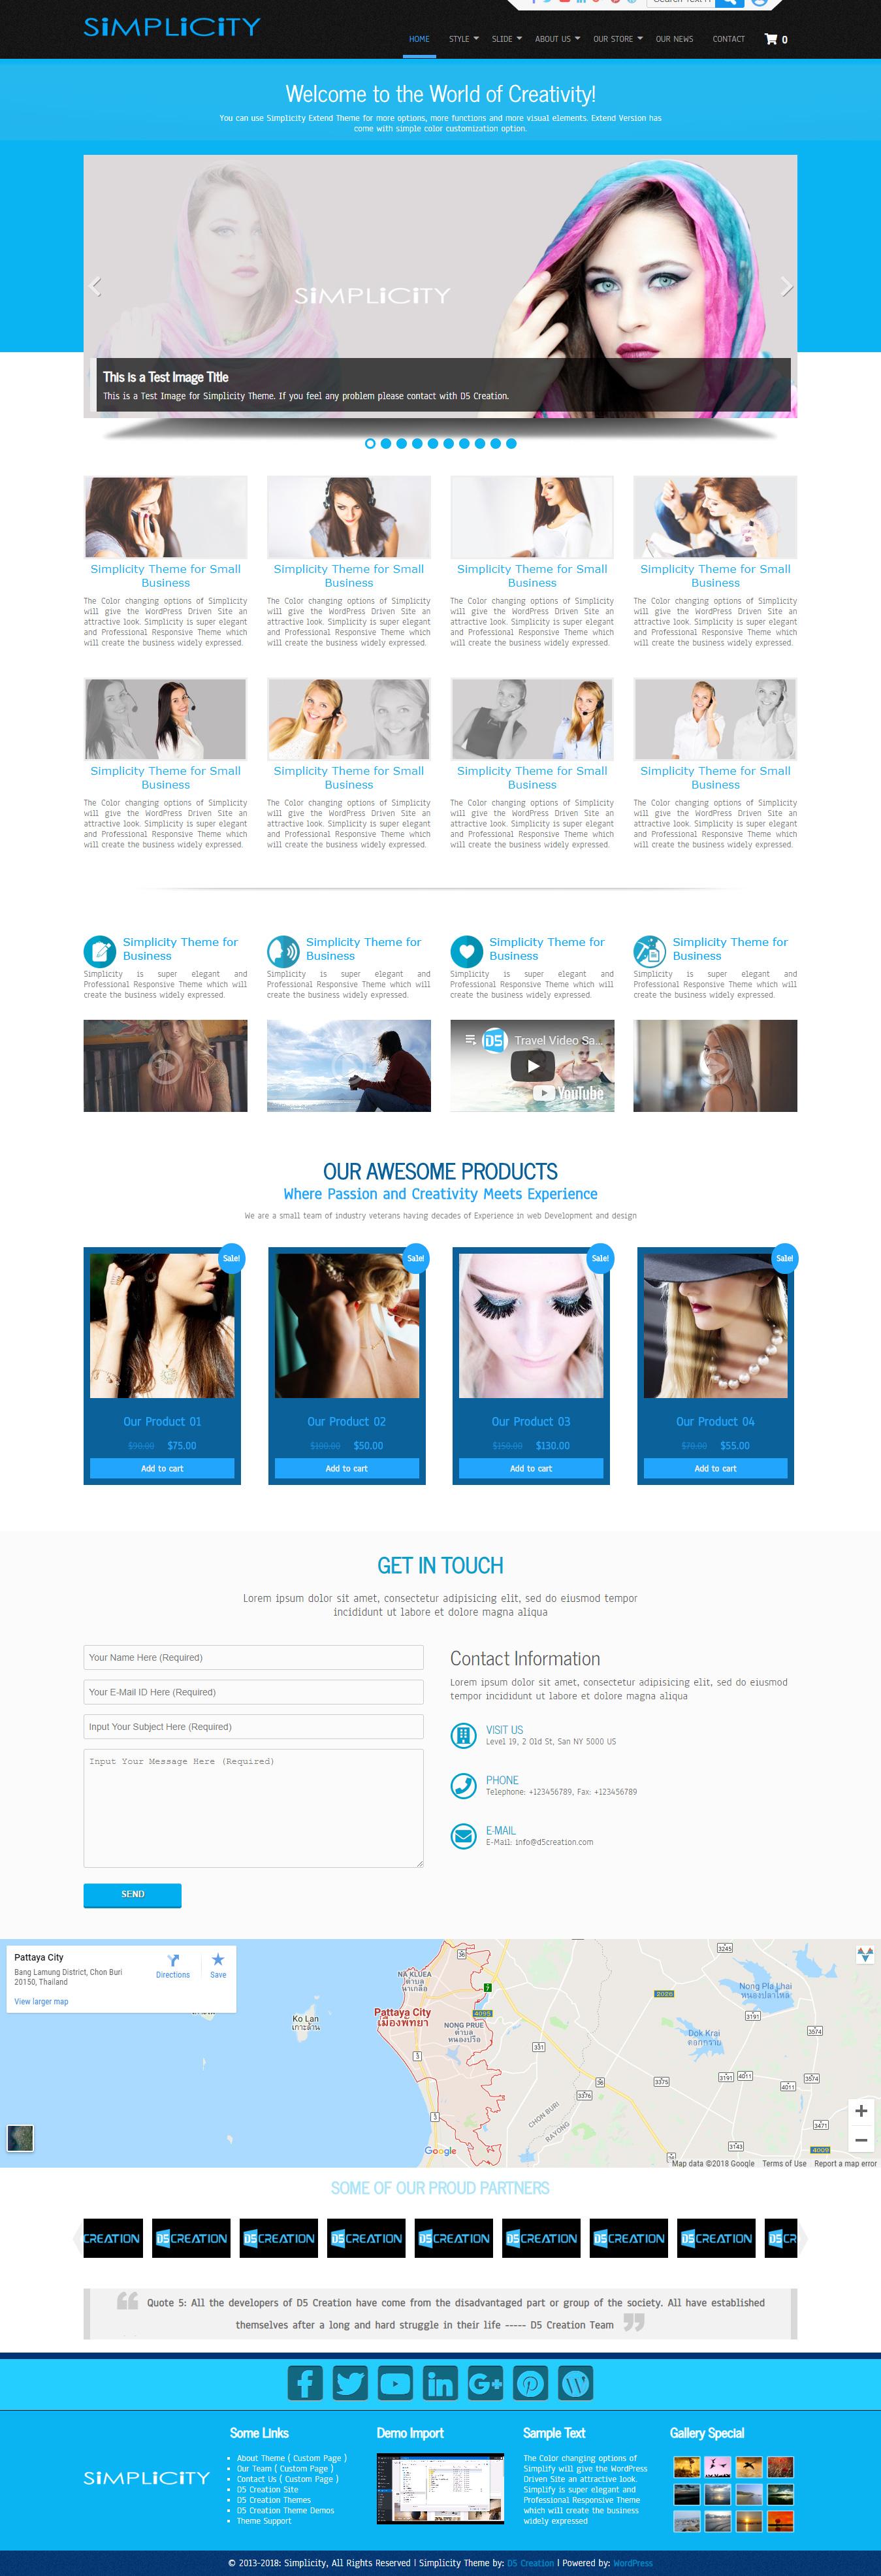 Simplicity, Powerful but Simple WordPress Theme